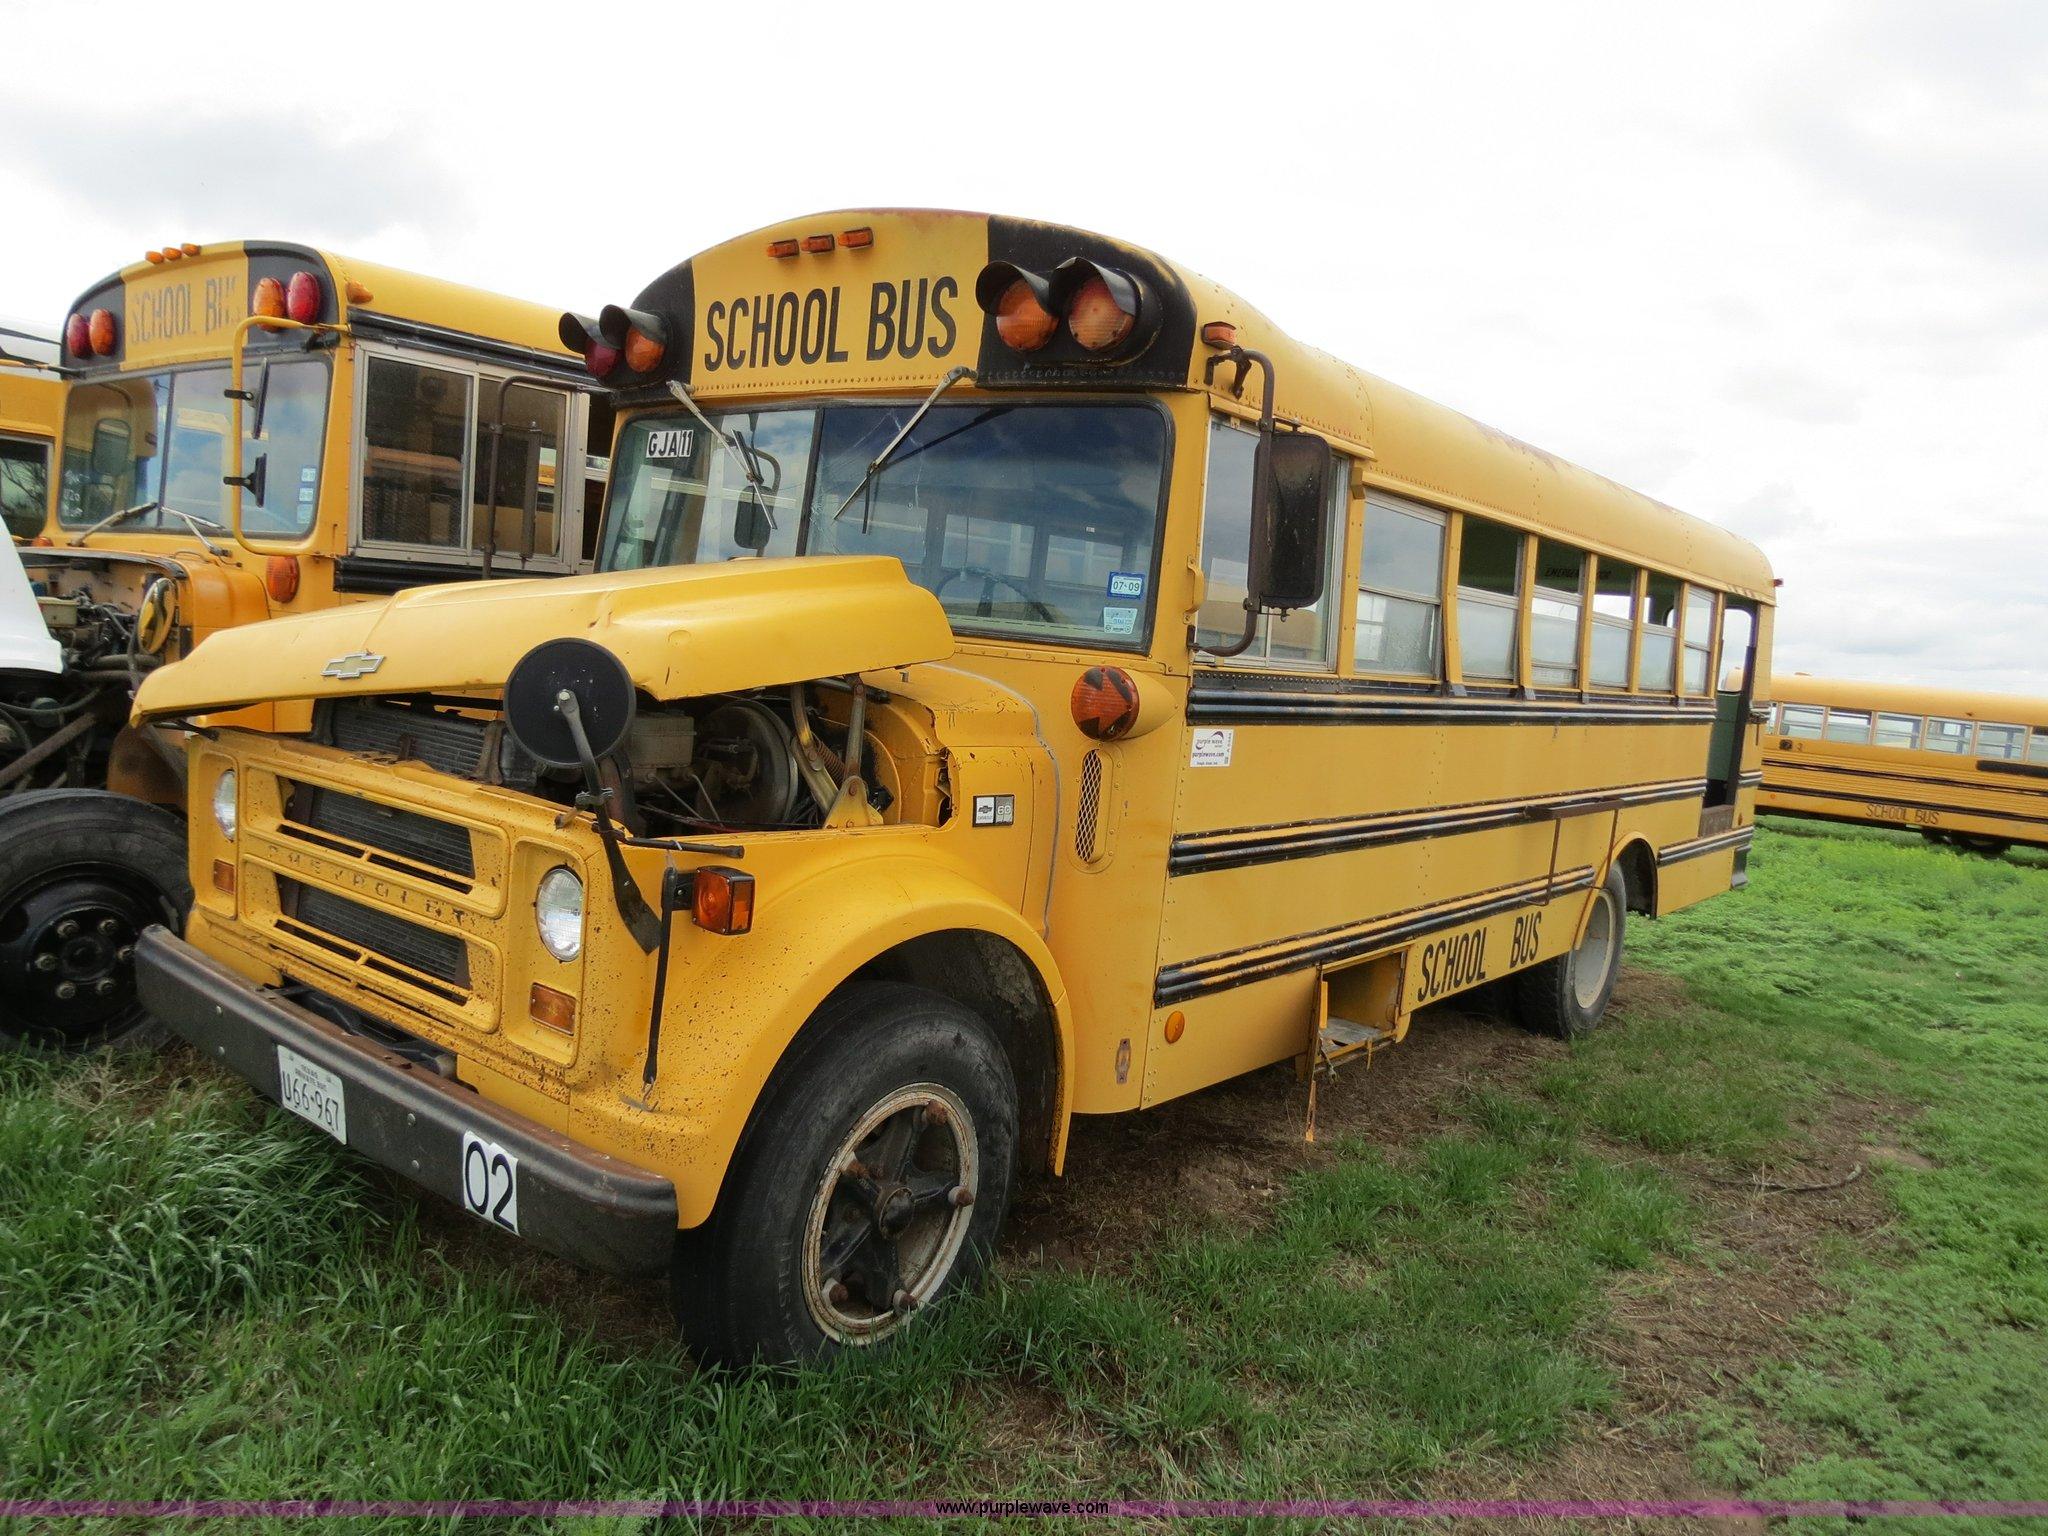 1983 Chevrolet school bus | Item A5344 | SOLD! June 27 Midwe